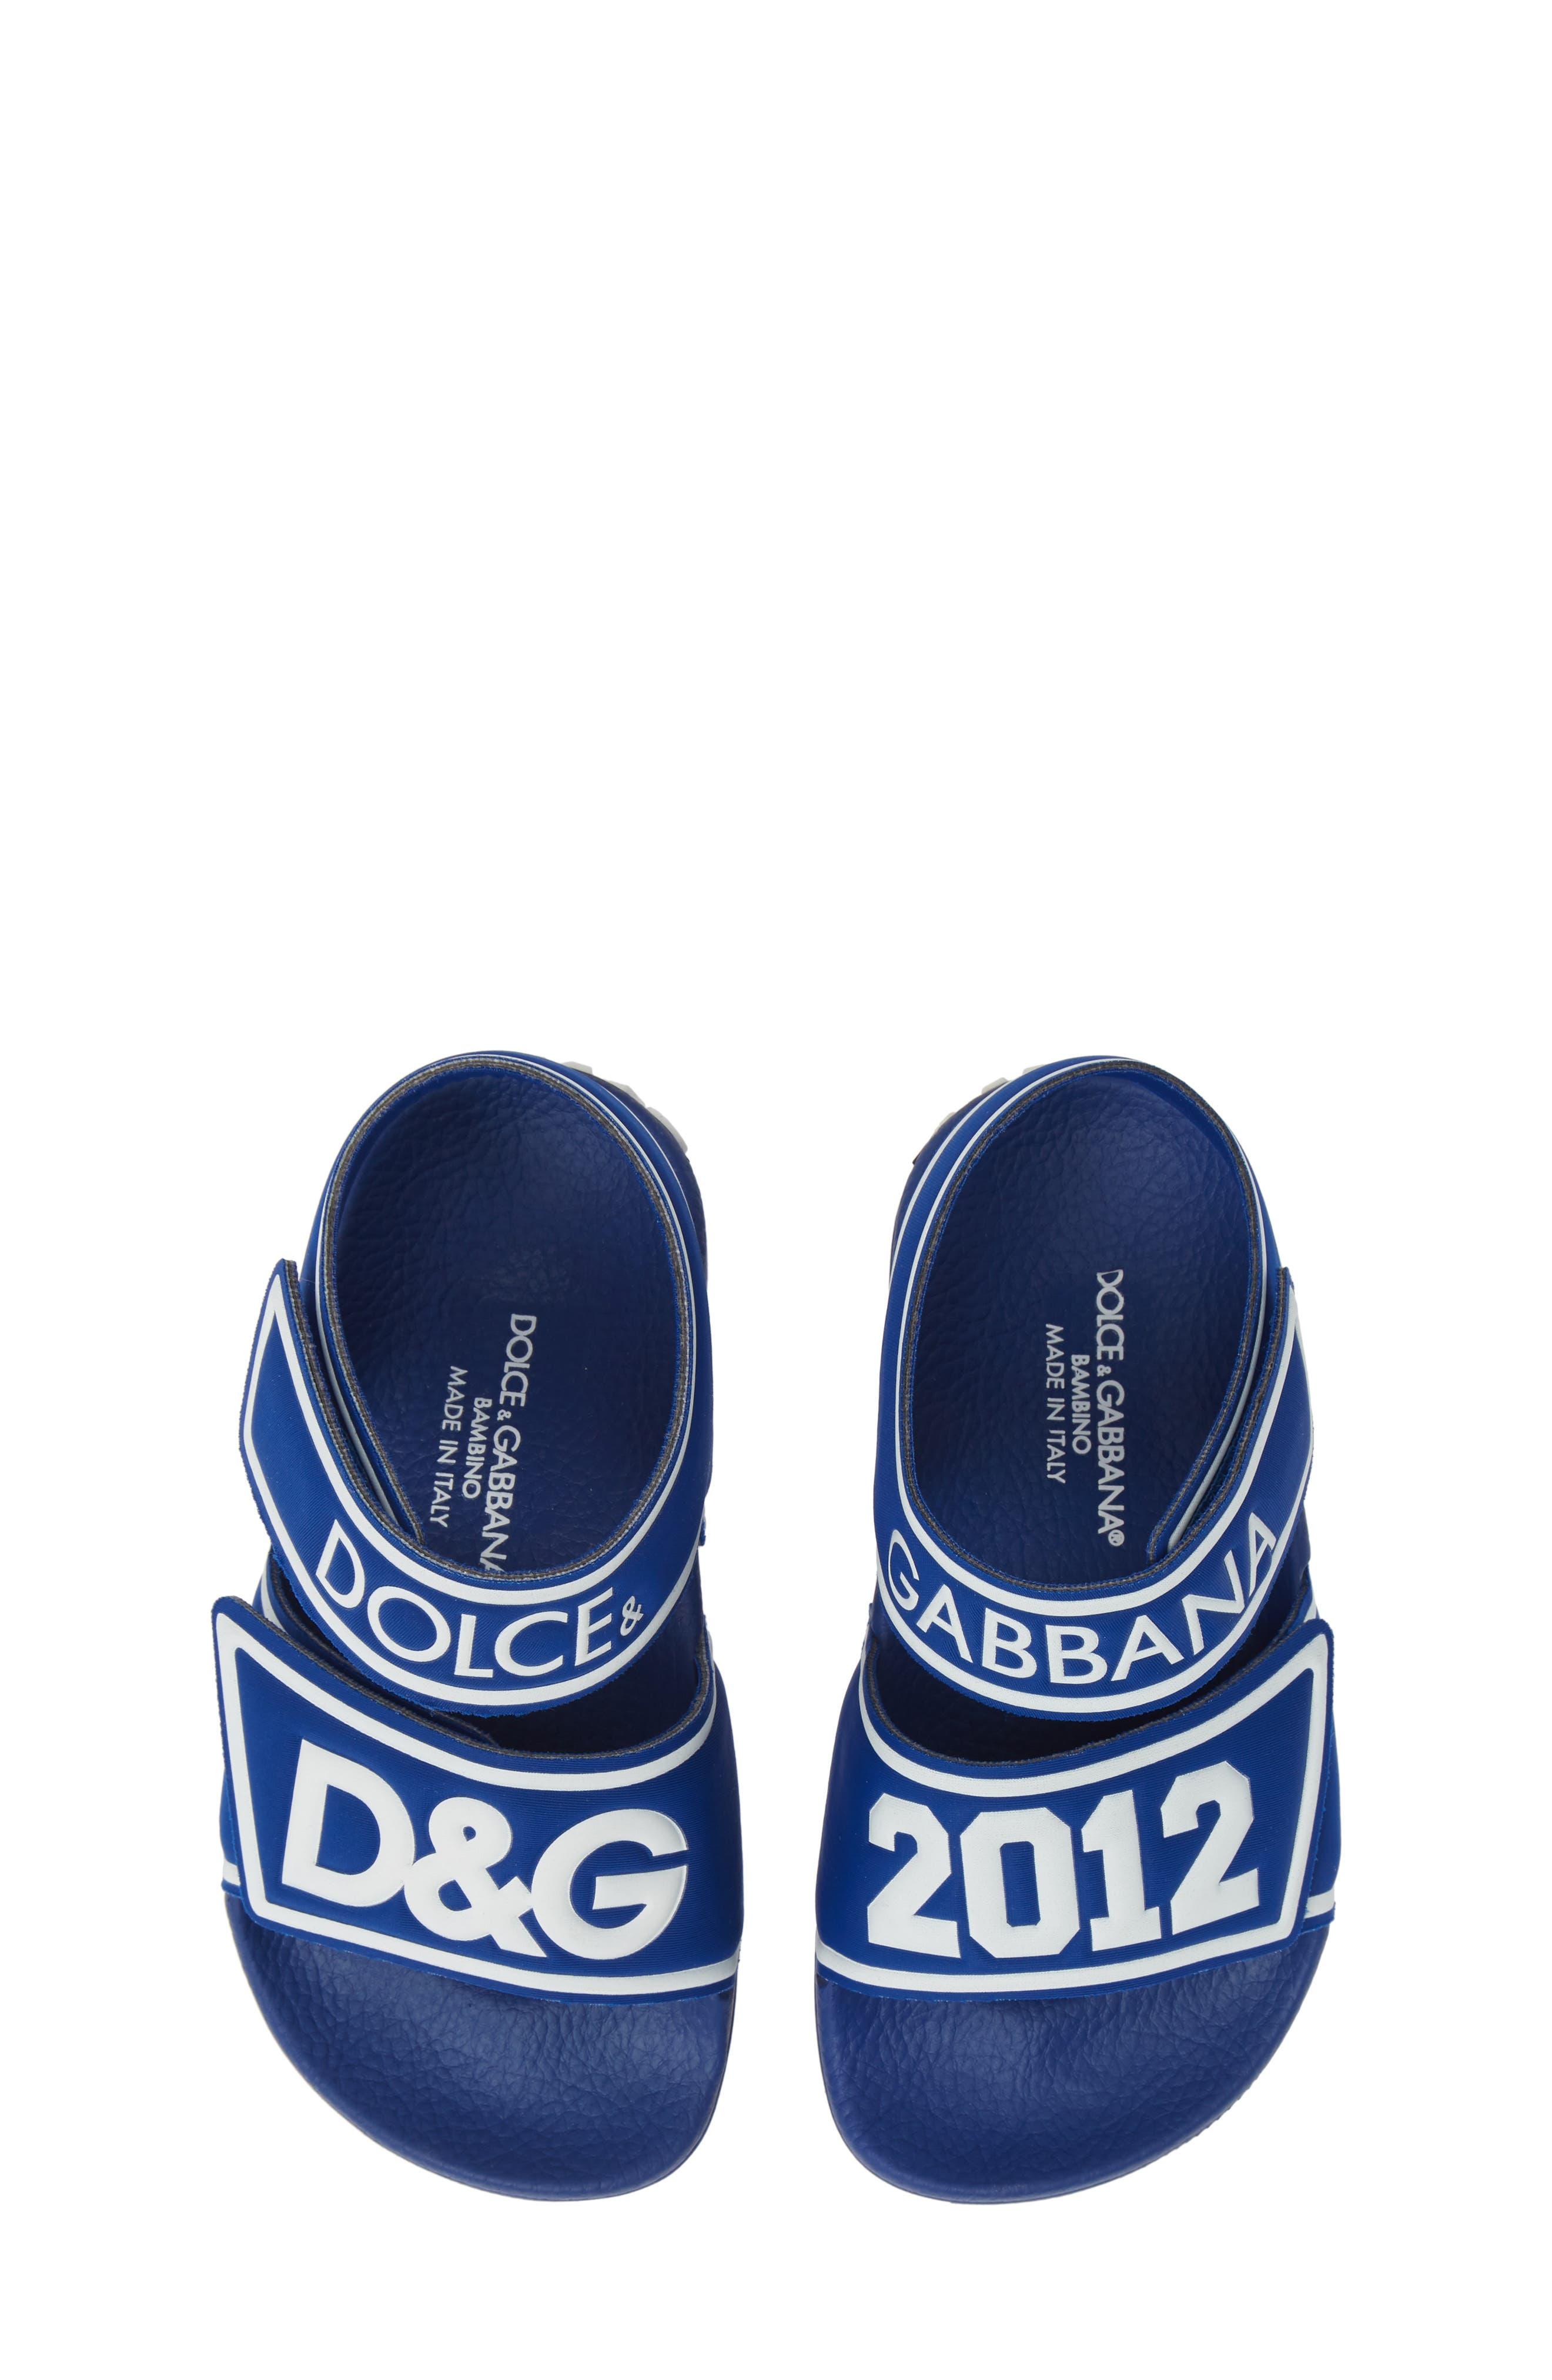 DOLCE&GABBANA Jelly Fisherman Sandal, Main, color, BLUE/ WHITE